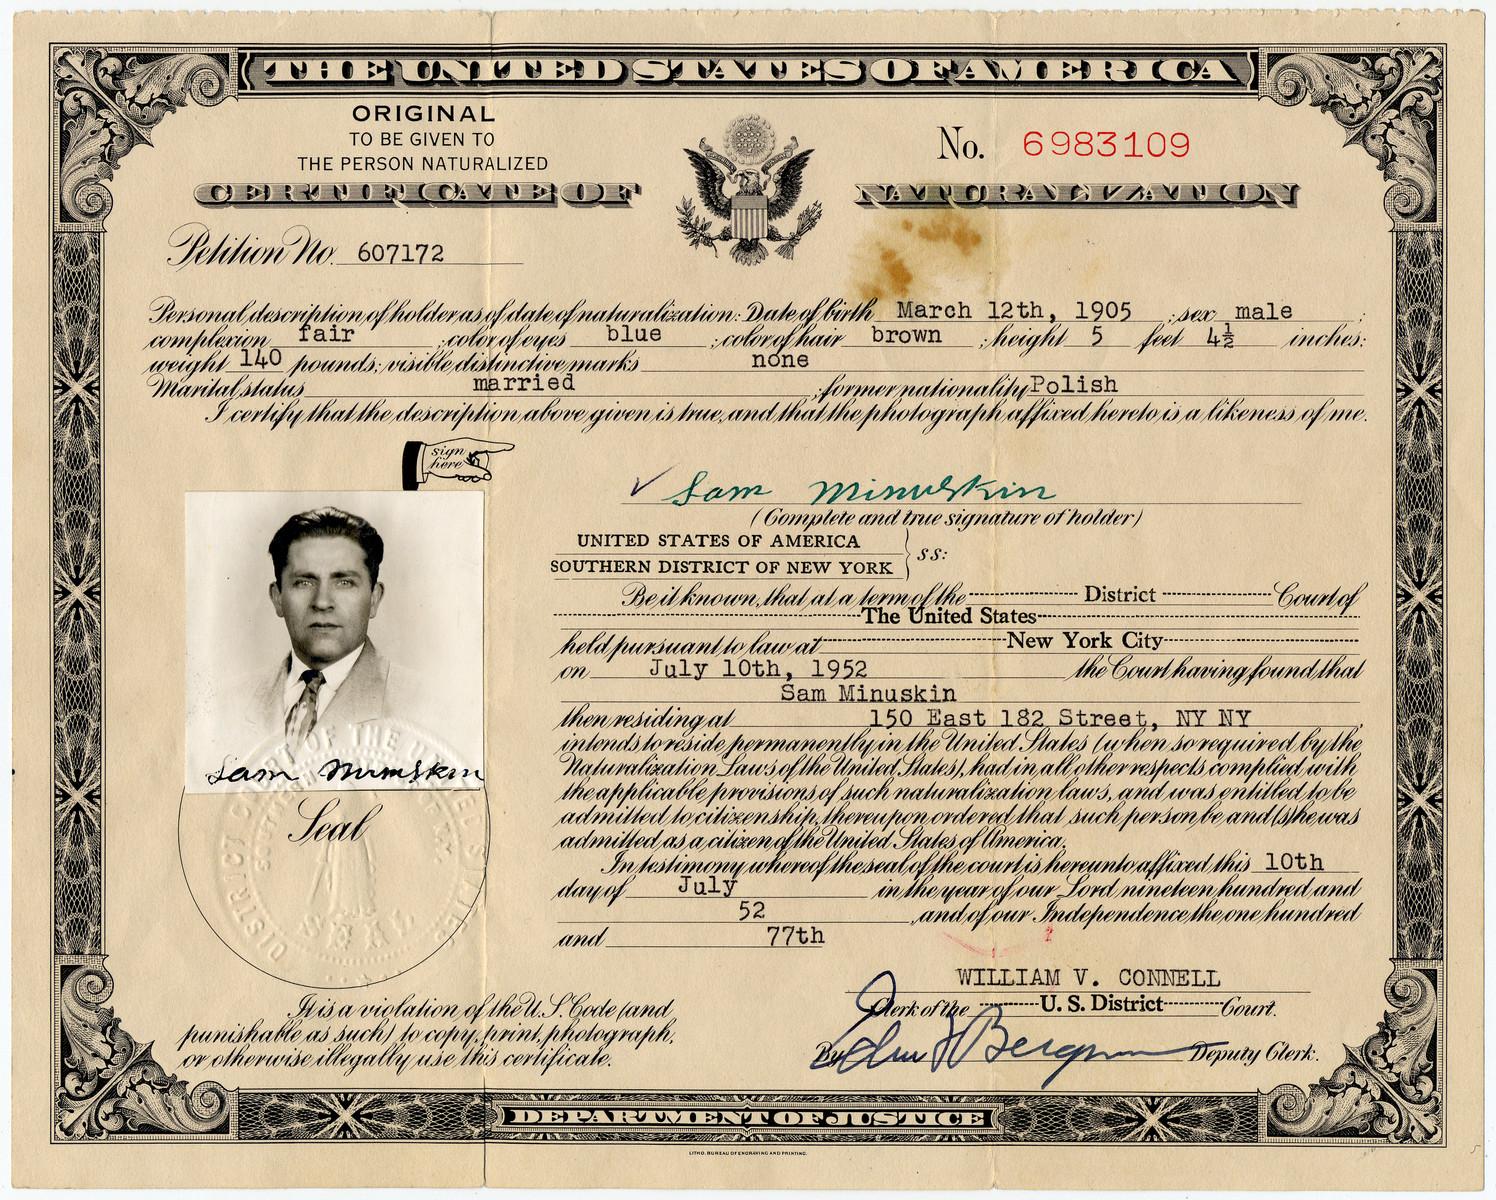 Certificate of Naturalization issued to Sam Minuskin.